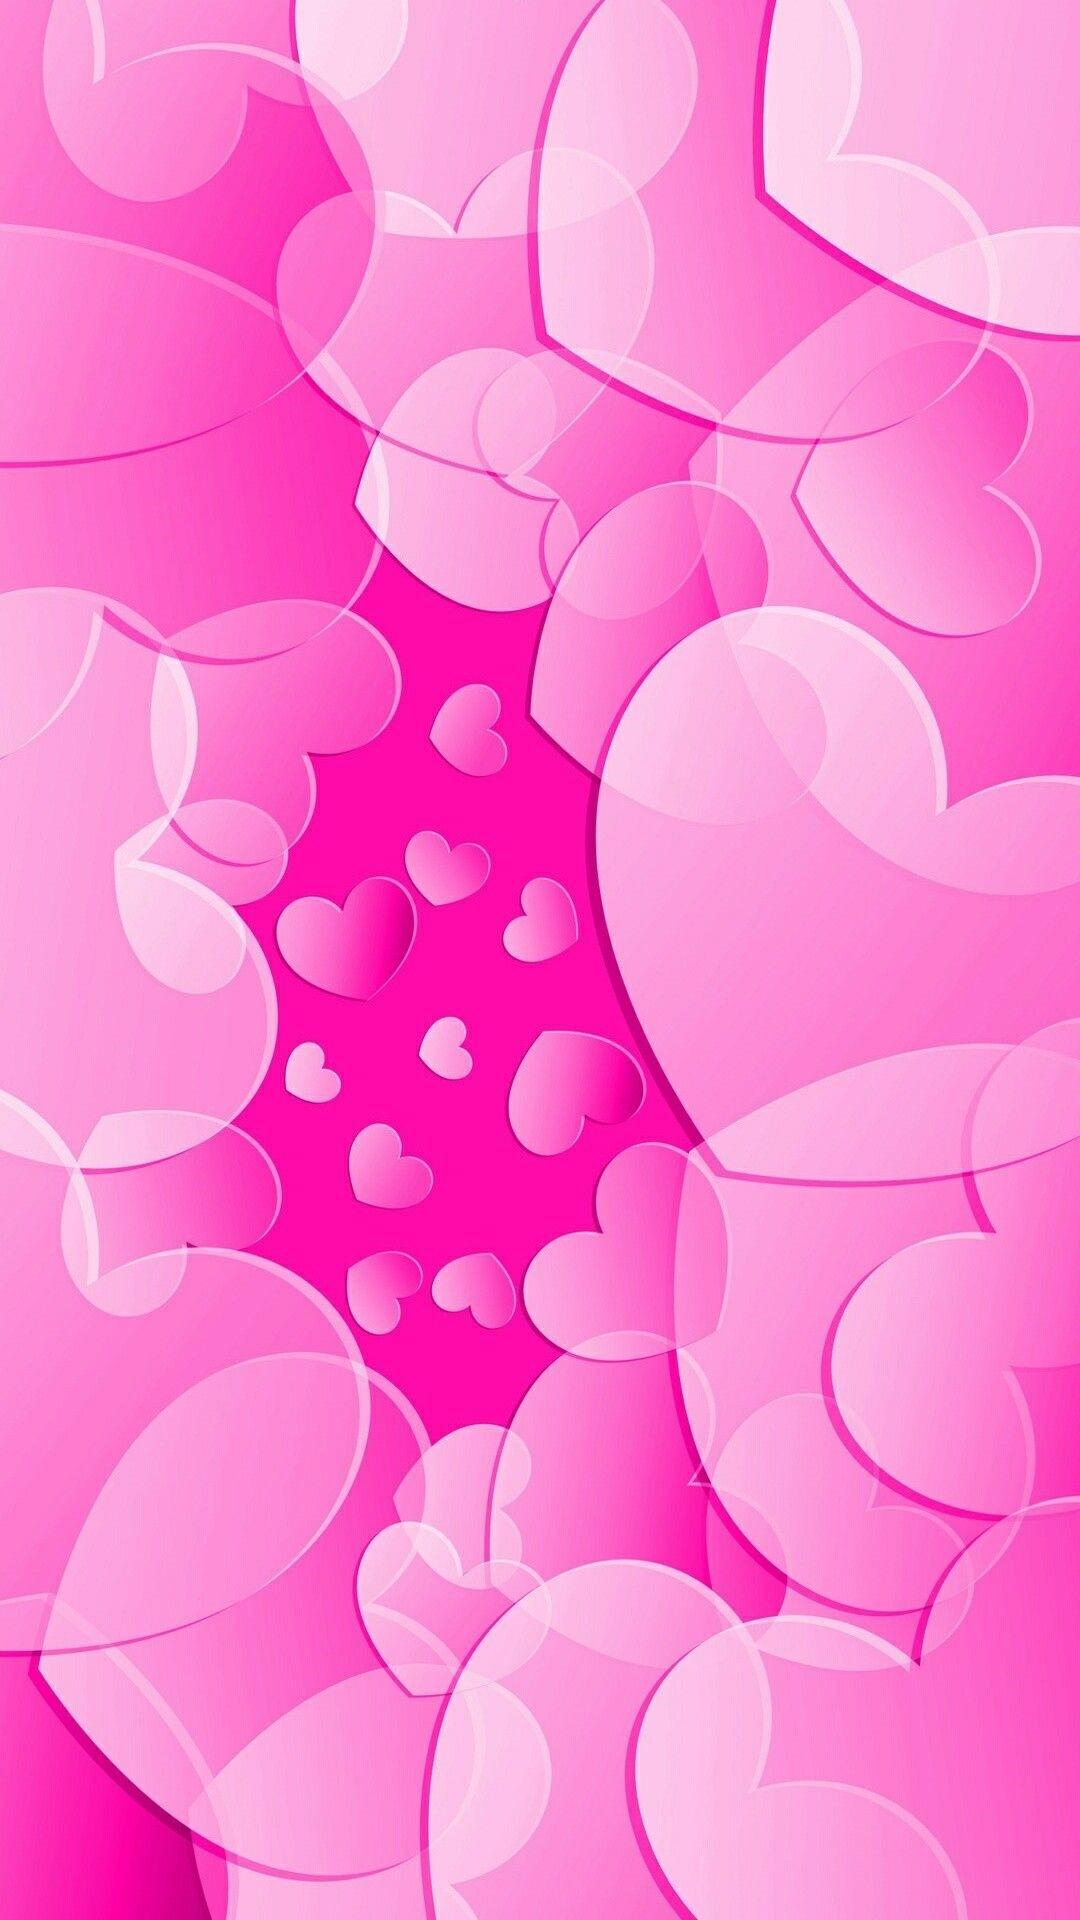 Pink iPhone 6 wallpaper